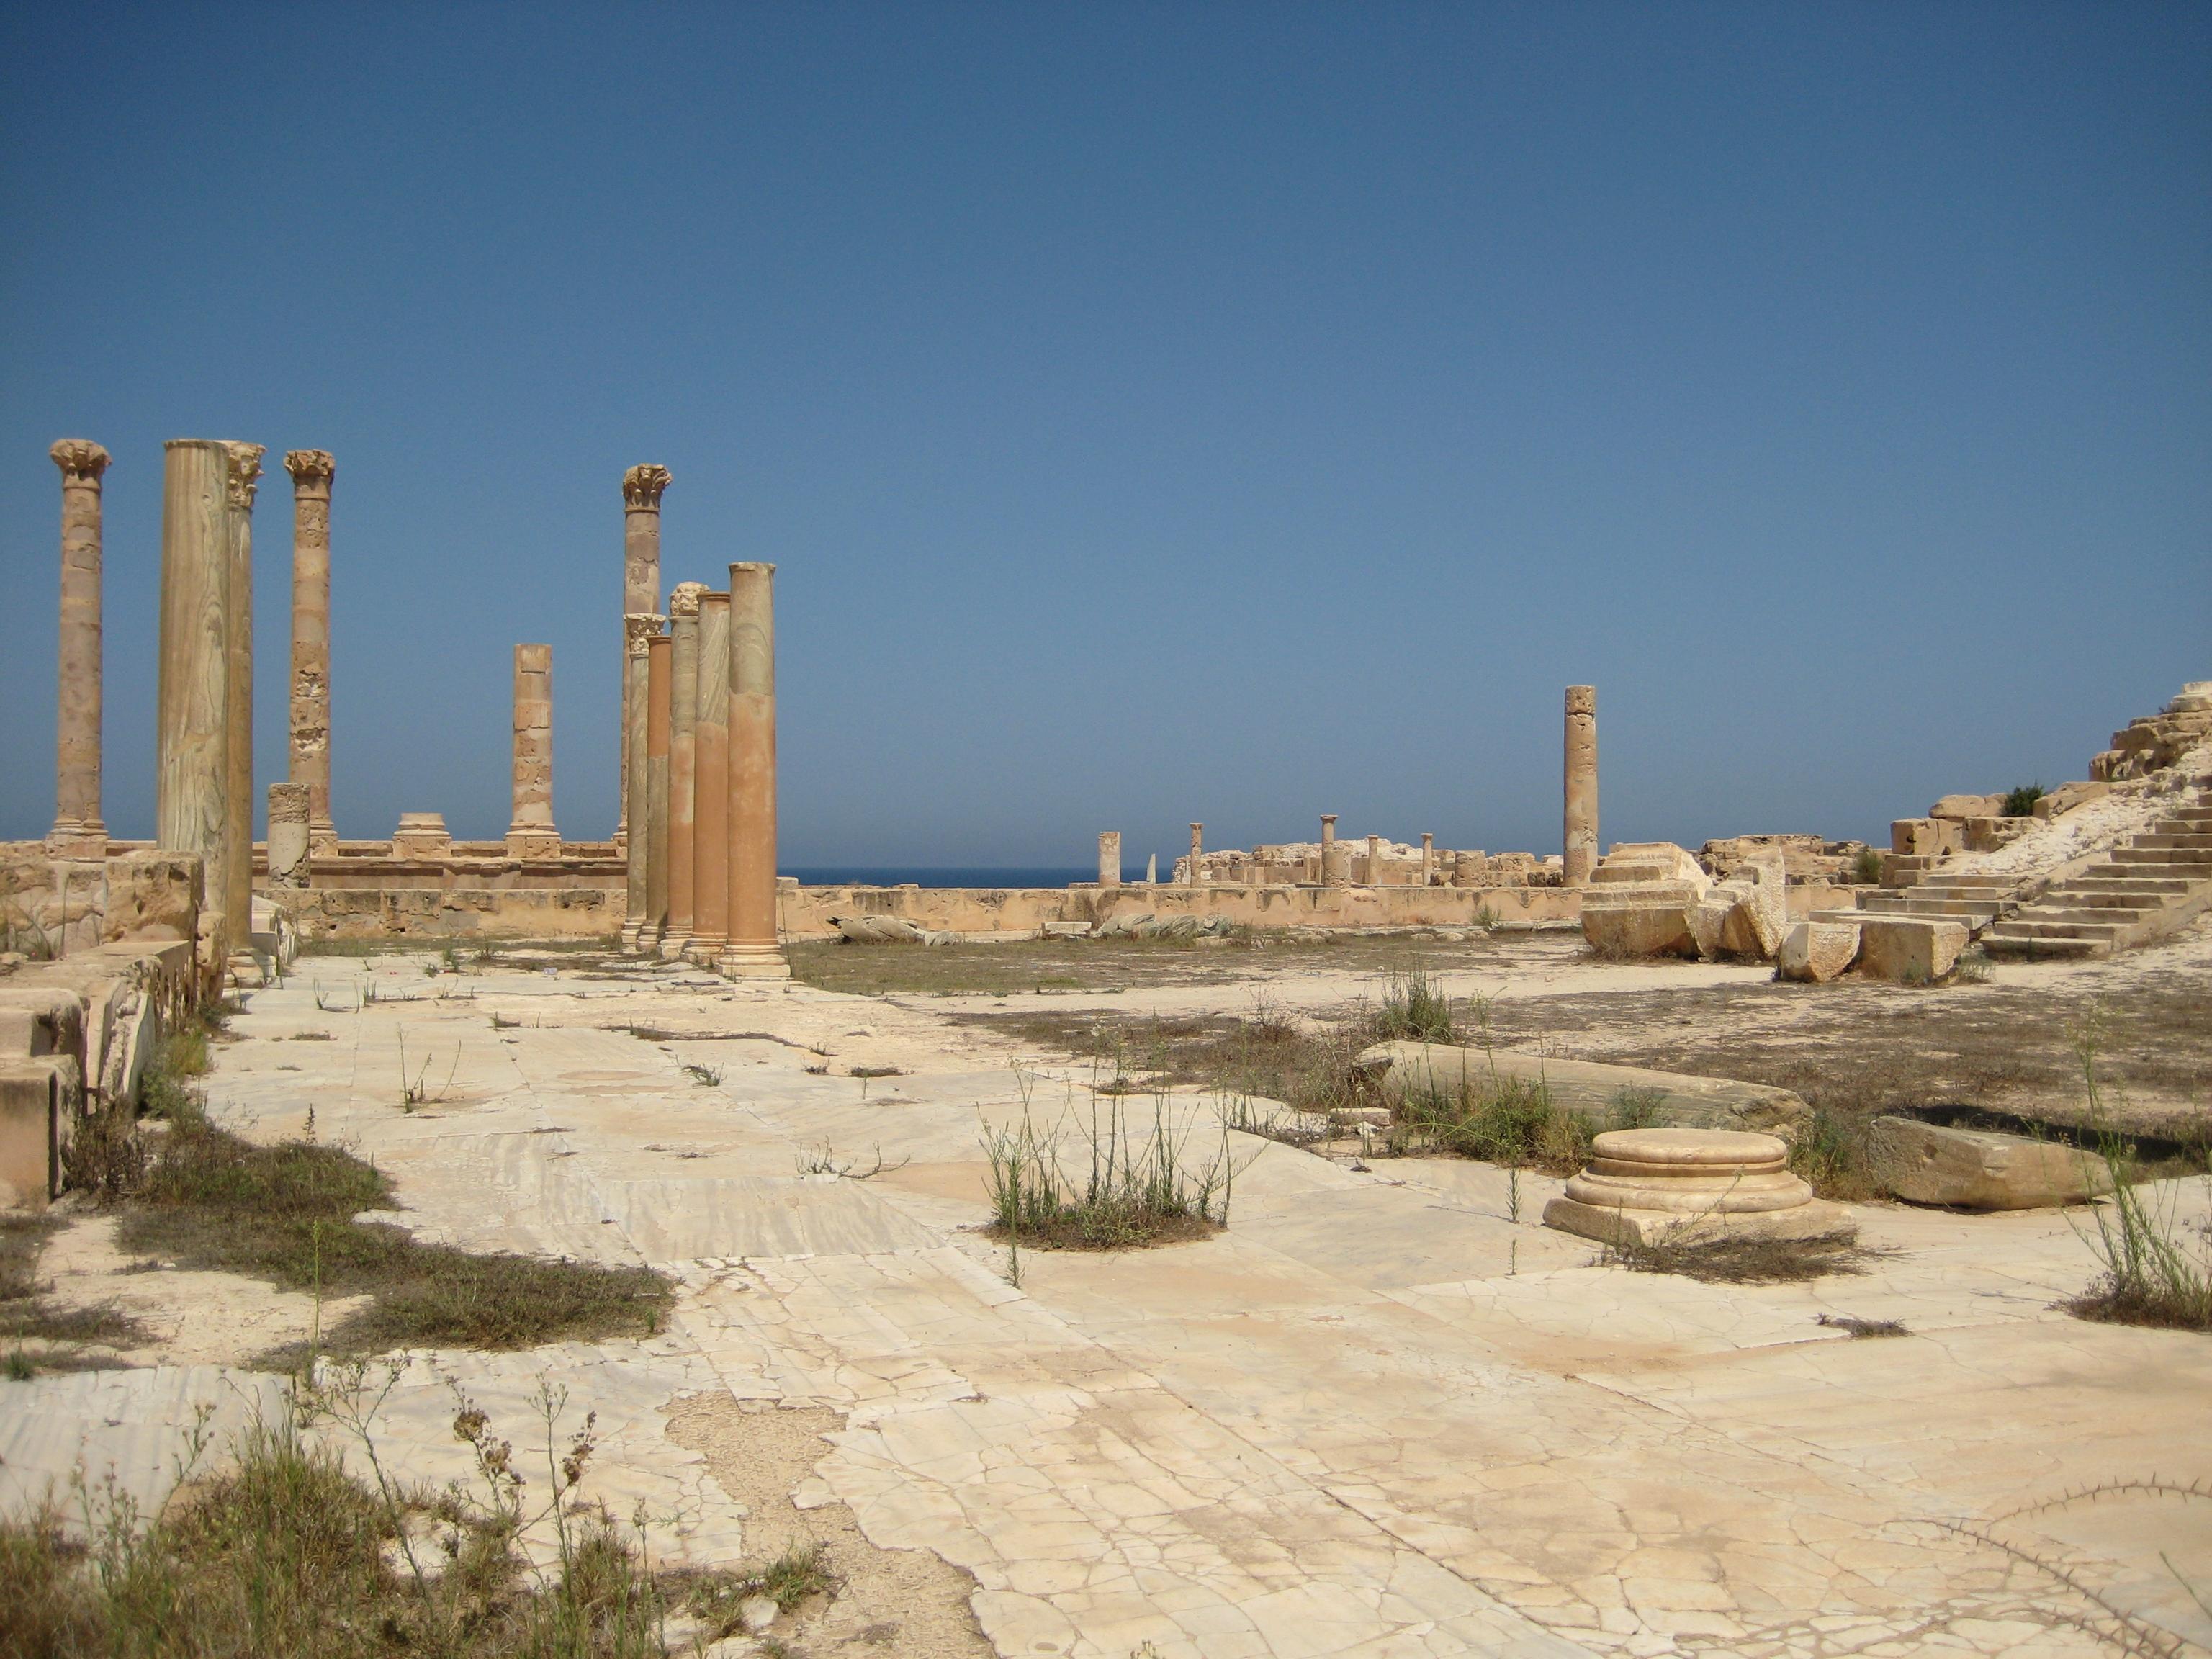 https://upload.wikimedia.org/wikipedia/commons/8/8f/Portic_Antonine_Temple_Sabratha.JPG